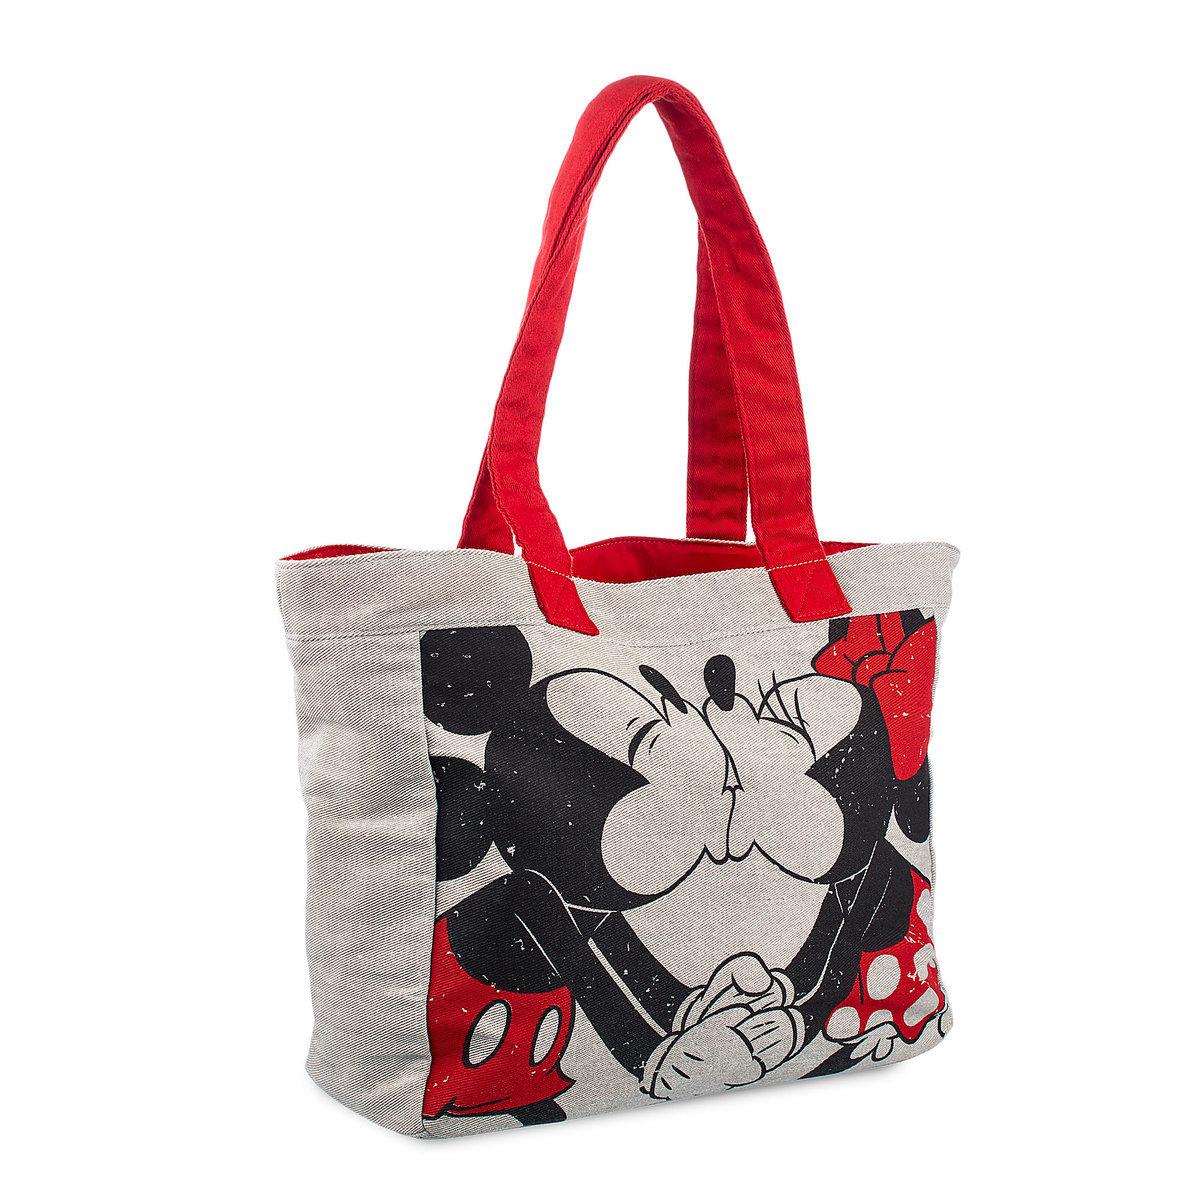 disney canvas tote bag valentine s day sweethearts mickey minnie